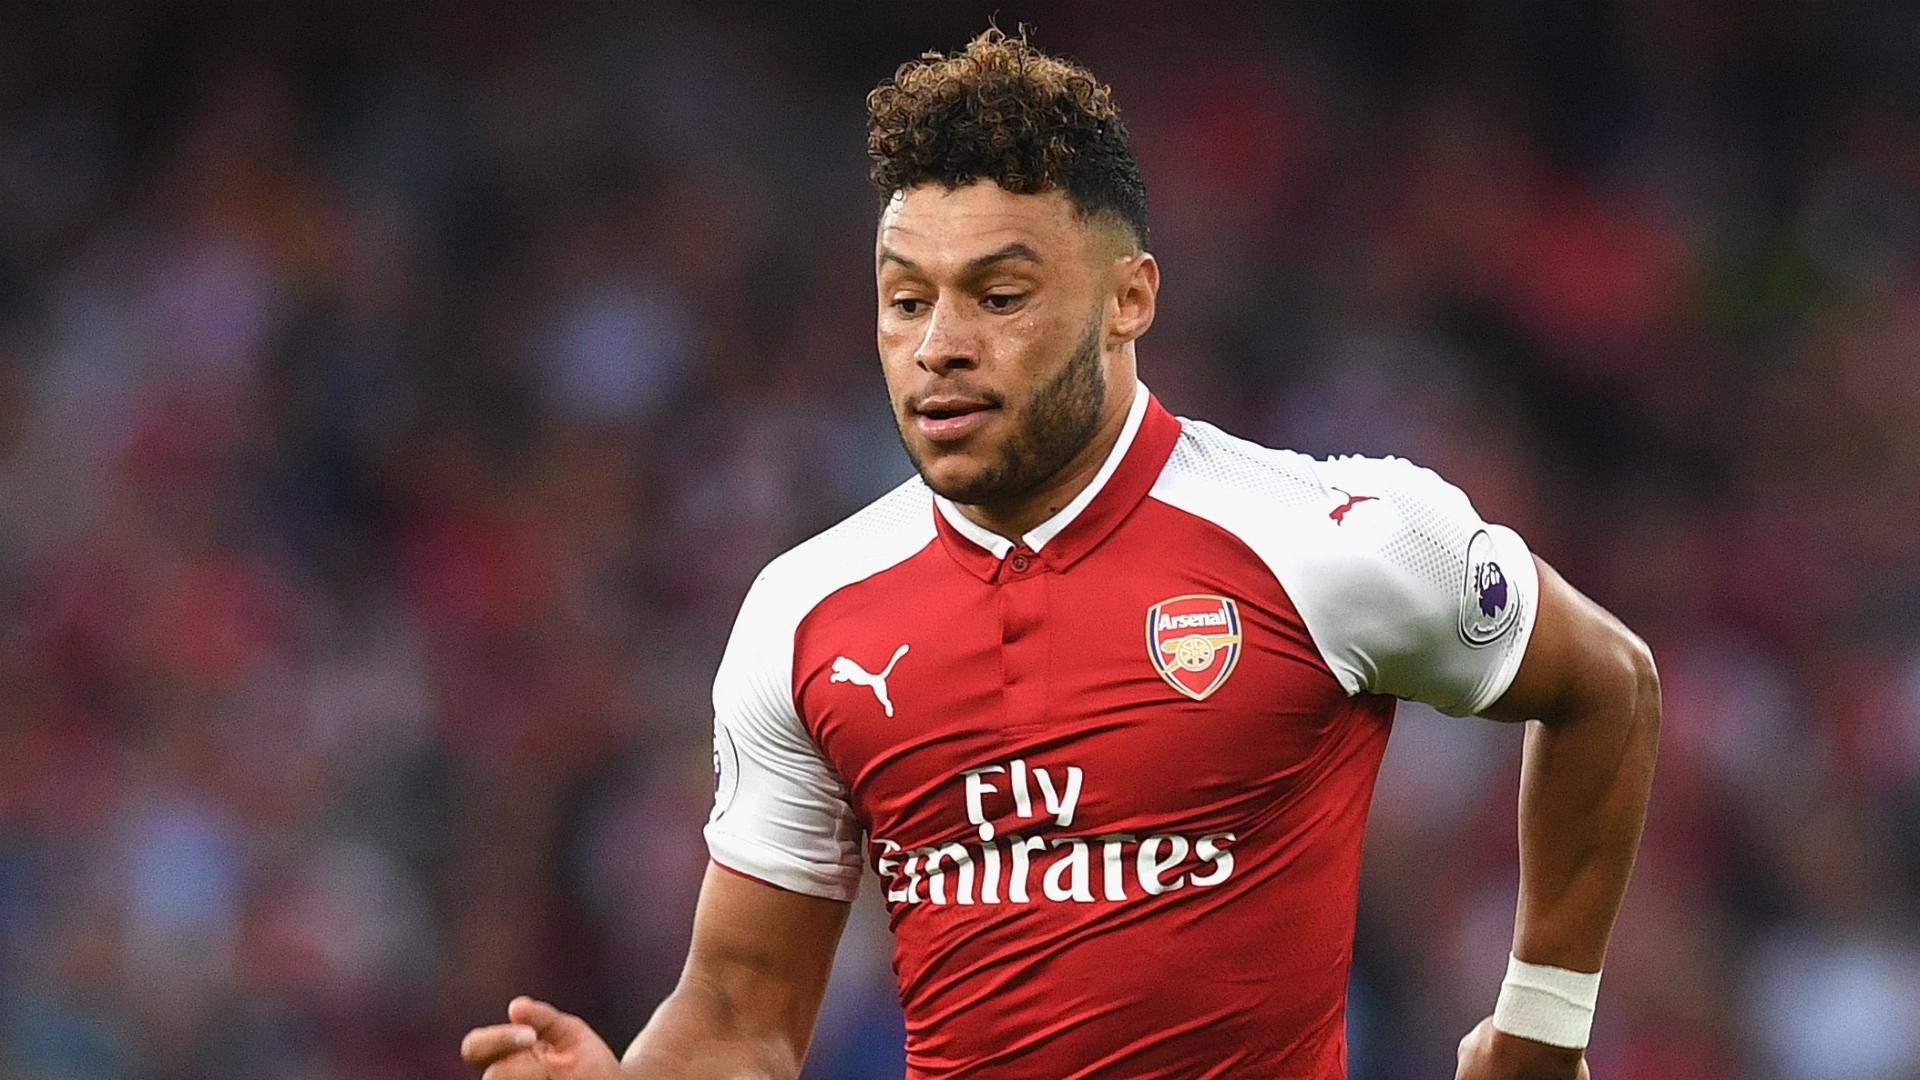 Arsenal must keep Oxlade-Chamberlain - Winterburn